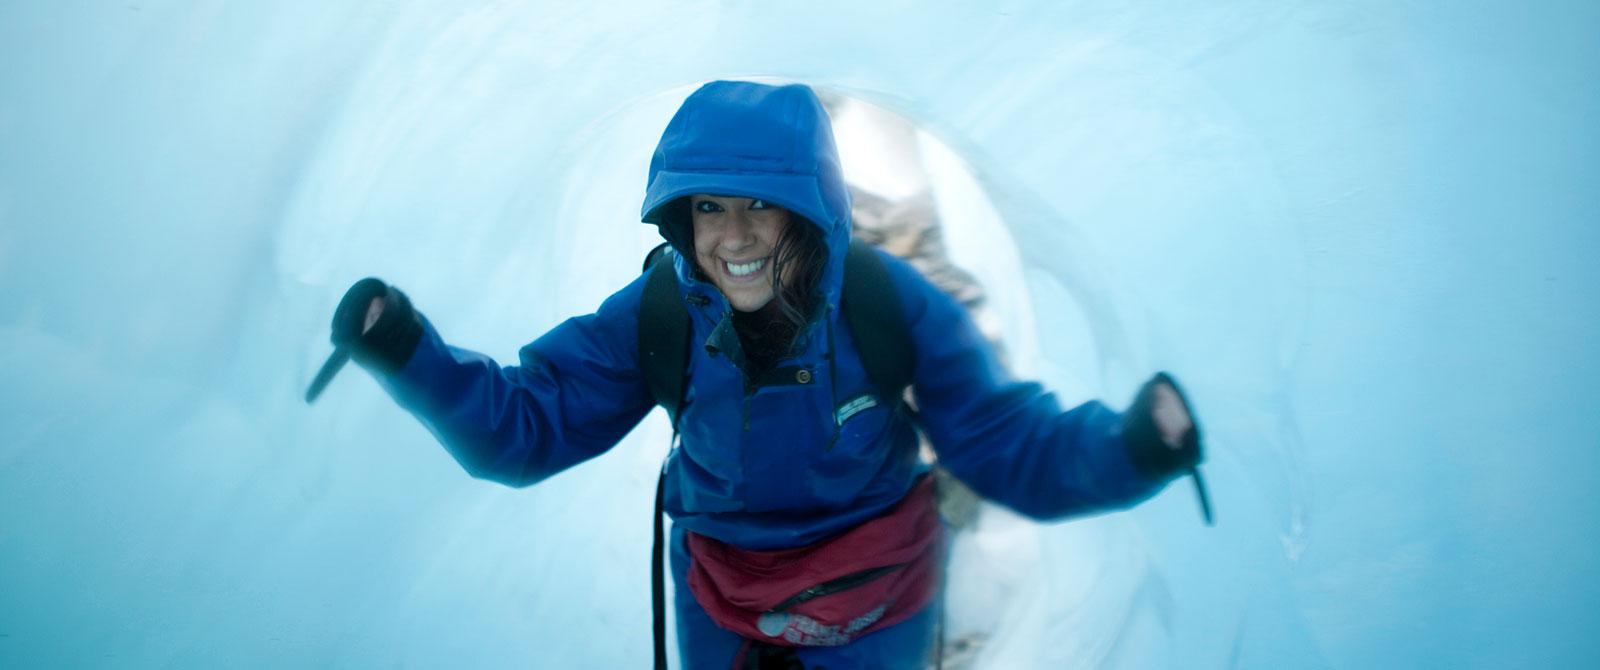 Heli Hiking on West Coast Glaciers - Book Your Trip to New Zealand - New Zealand Travel Agency